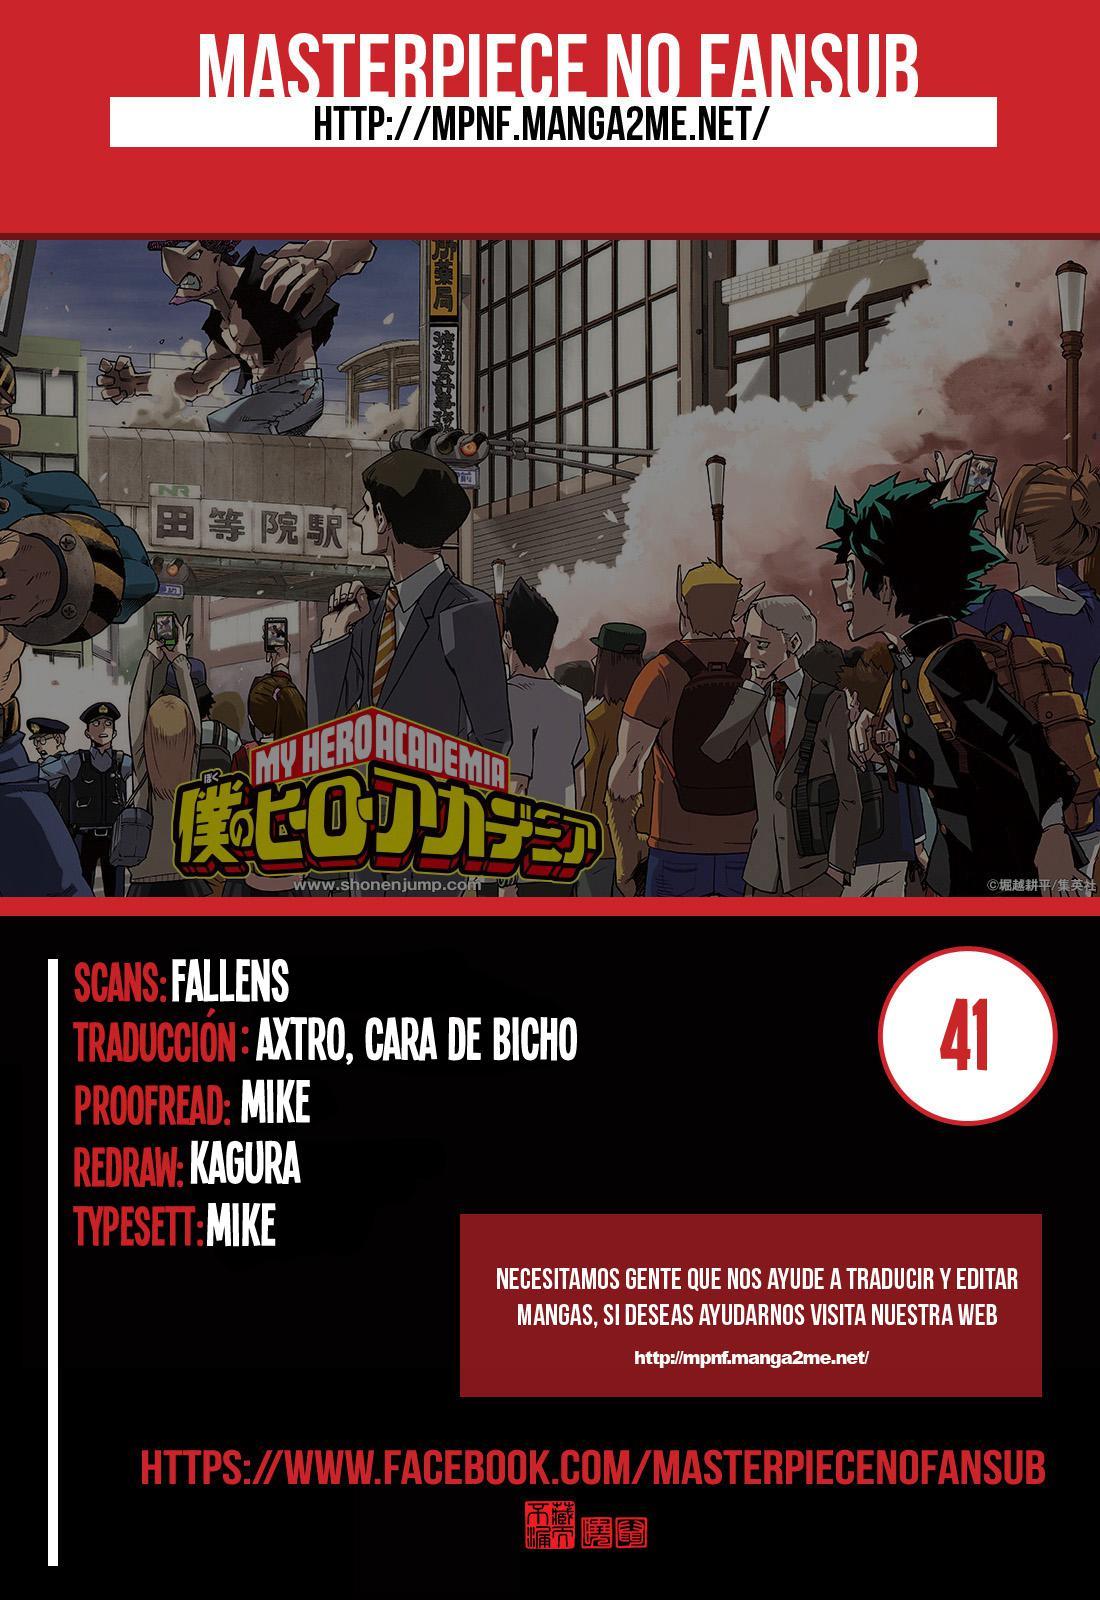 http://c5.ninemanga.com/es_manga/54/182/367419/76bc29e1d0bf5e49454ce98cf25a2906.jpg Page 1